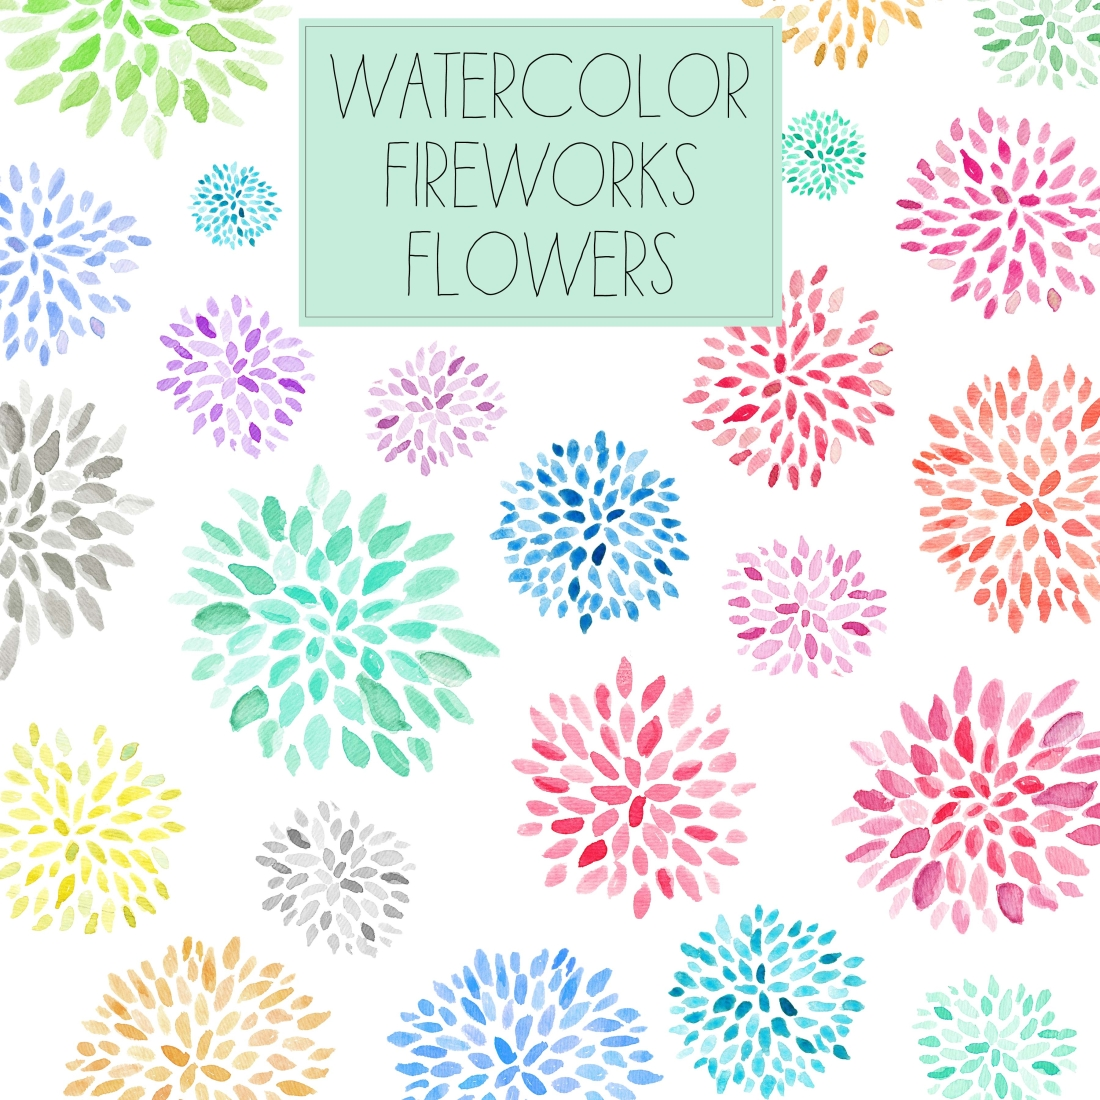 Fireworks clipart pastel Fireworks art Flower angiemakes com